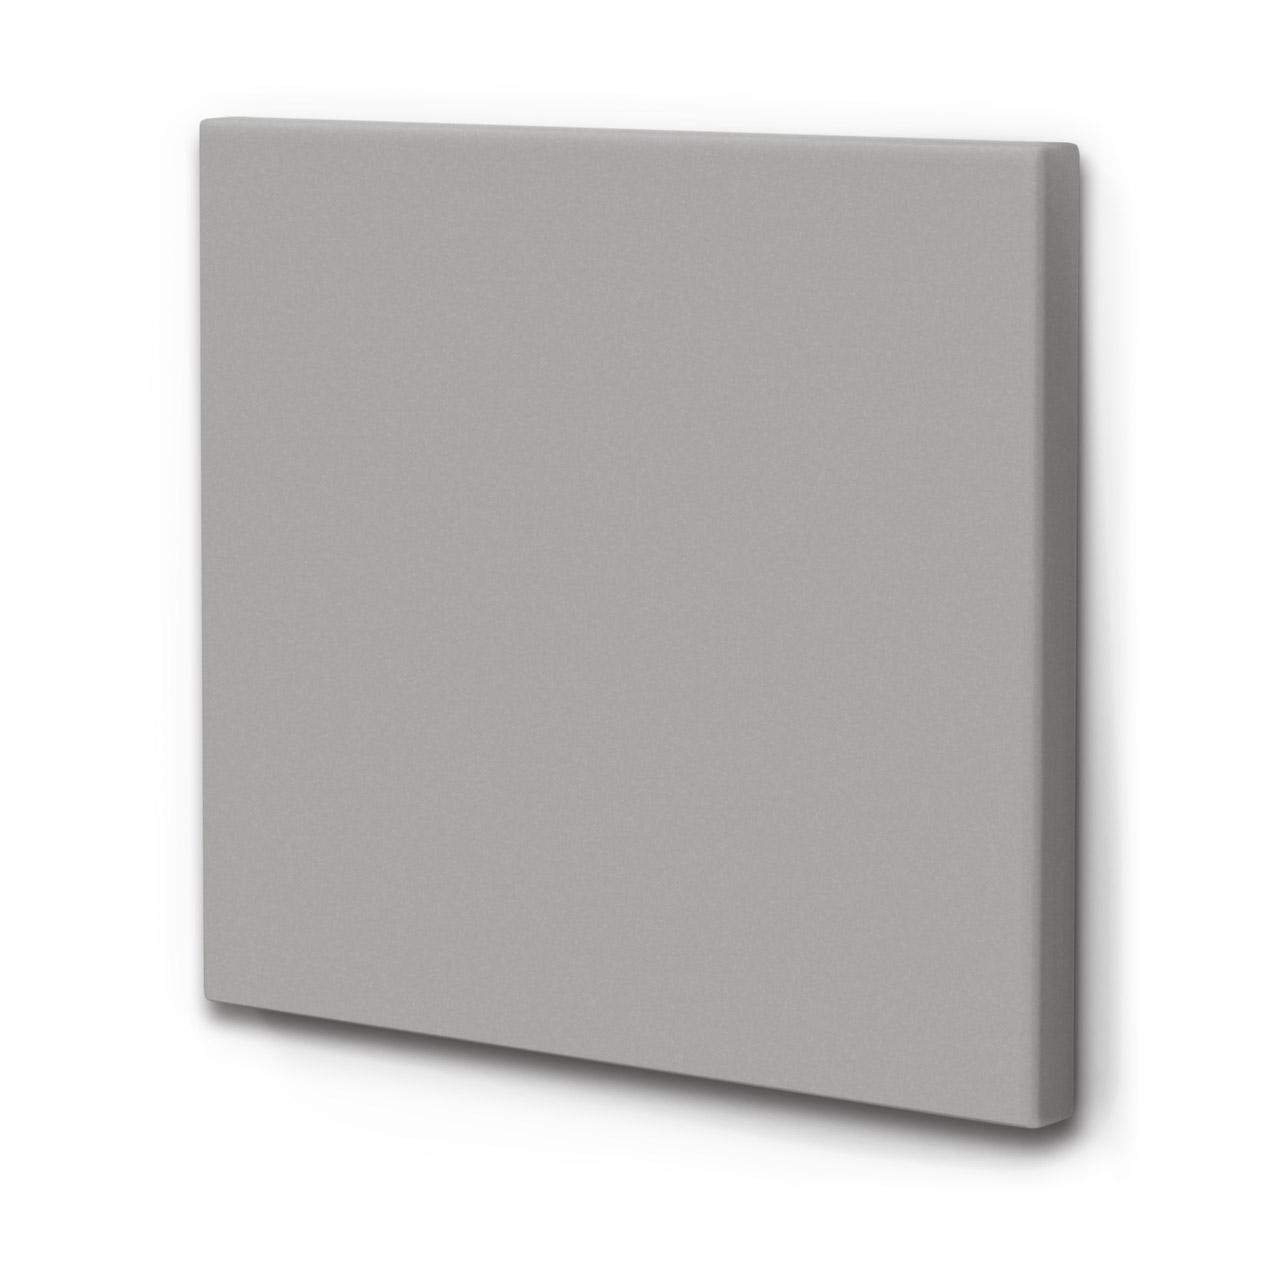 raumakustik verbessern schallabsorber akustikbild stein. Black Bedroom Furniture Sets. Home Design Ideas